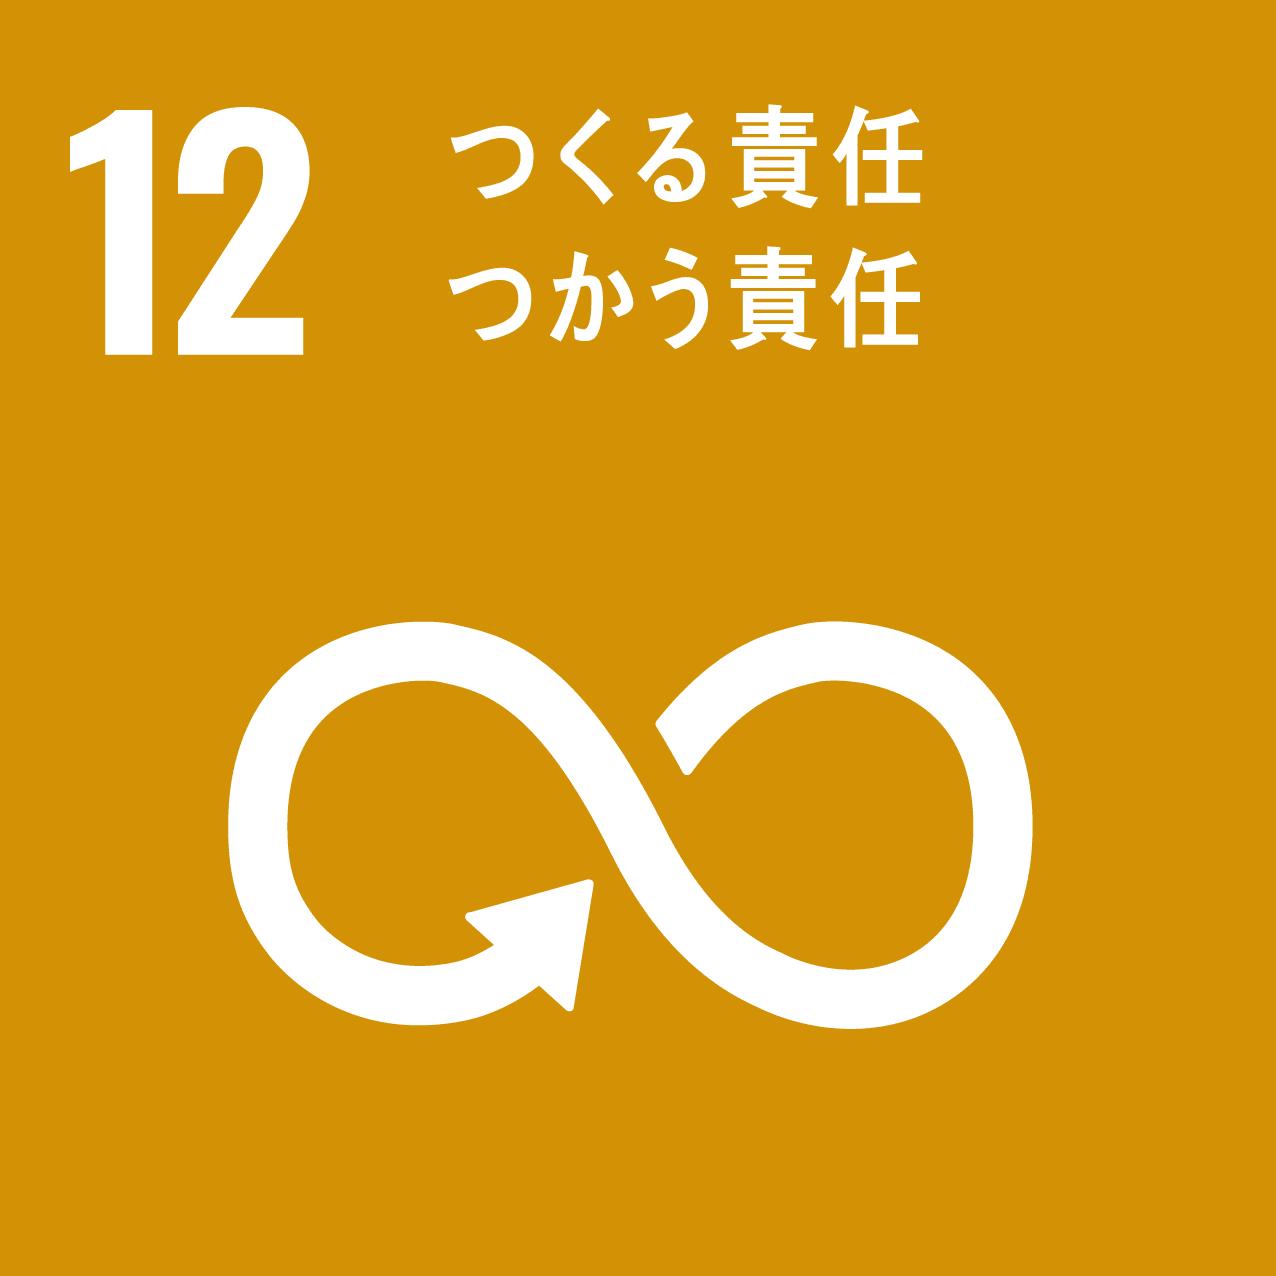 https://okaji.co.jp/files/libs/108/202006151707327249.png